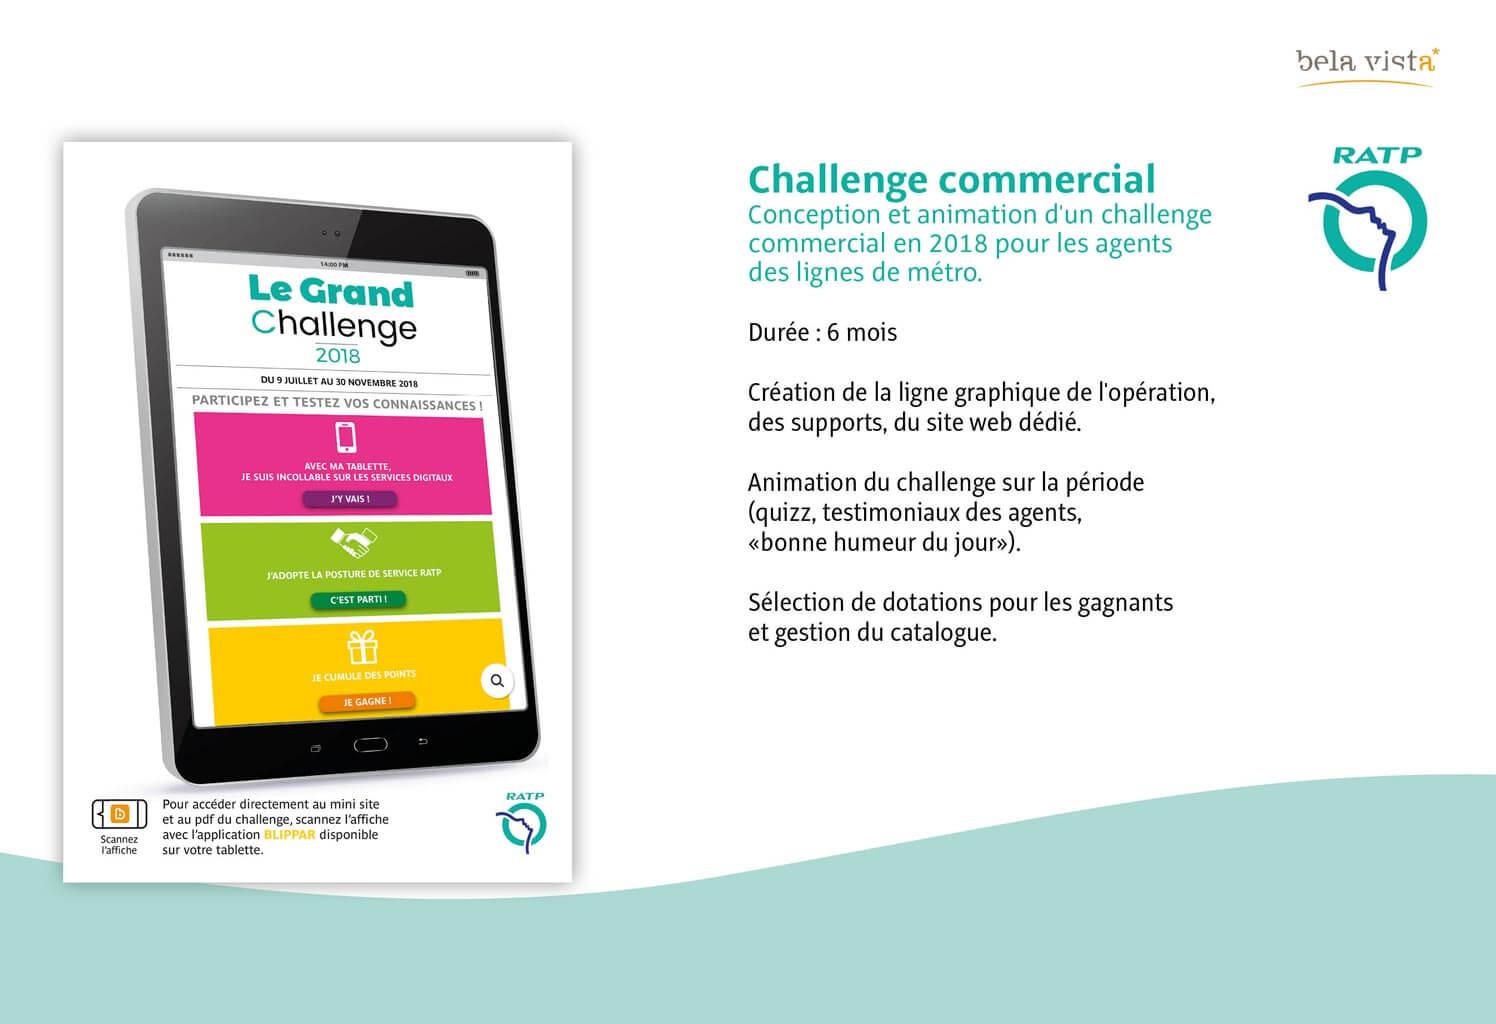 ratp_gd_challenge_2